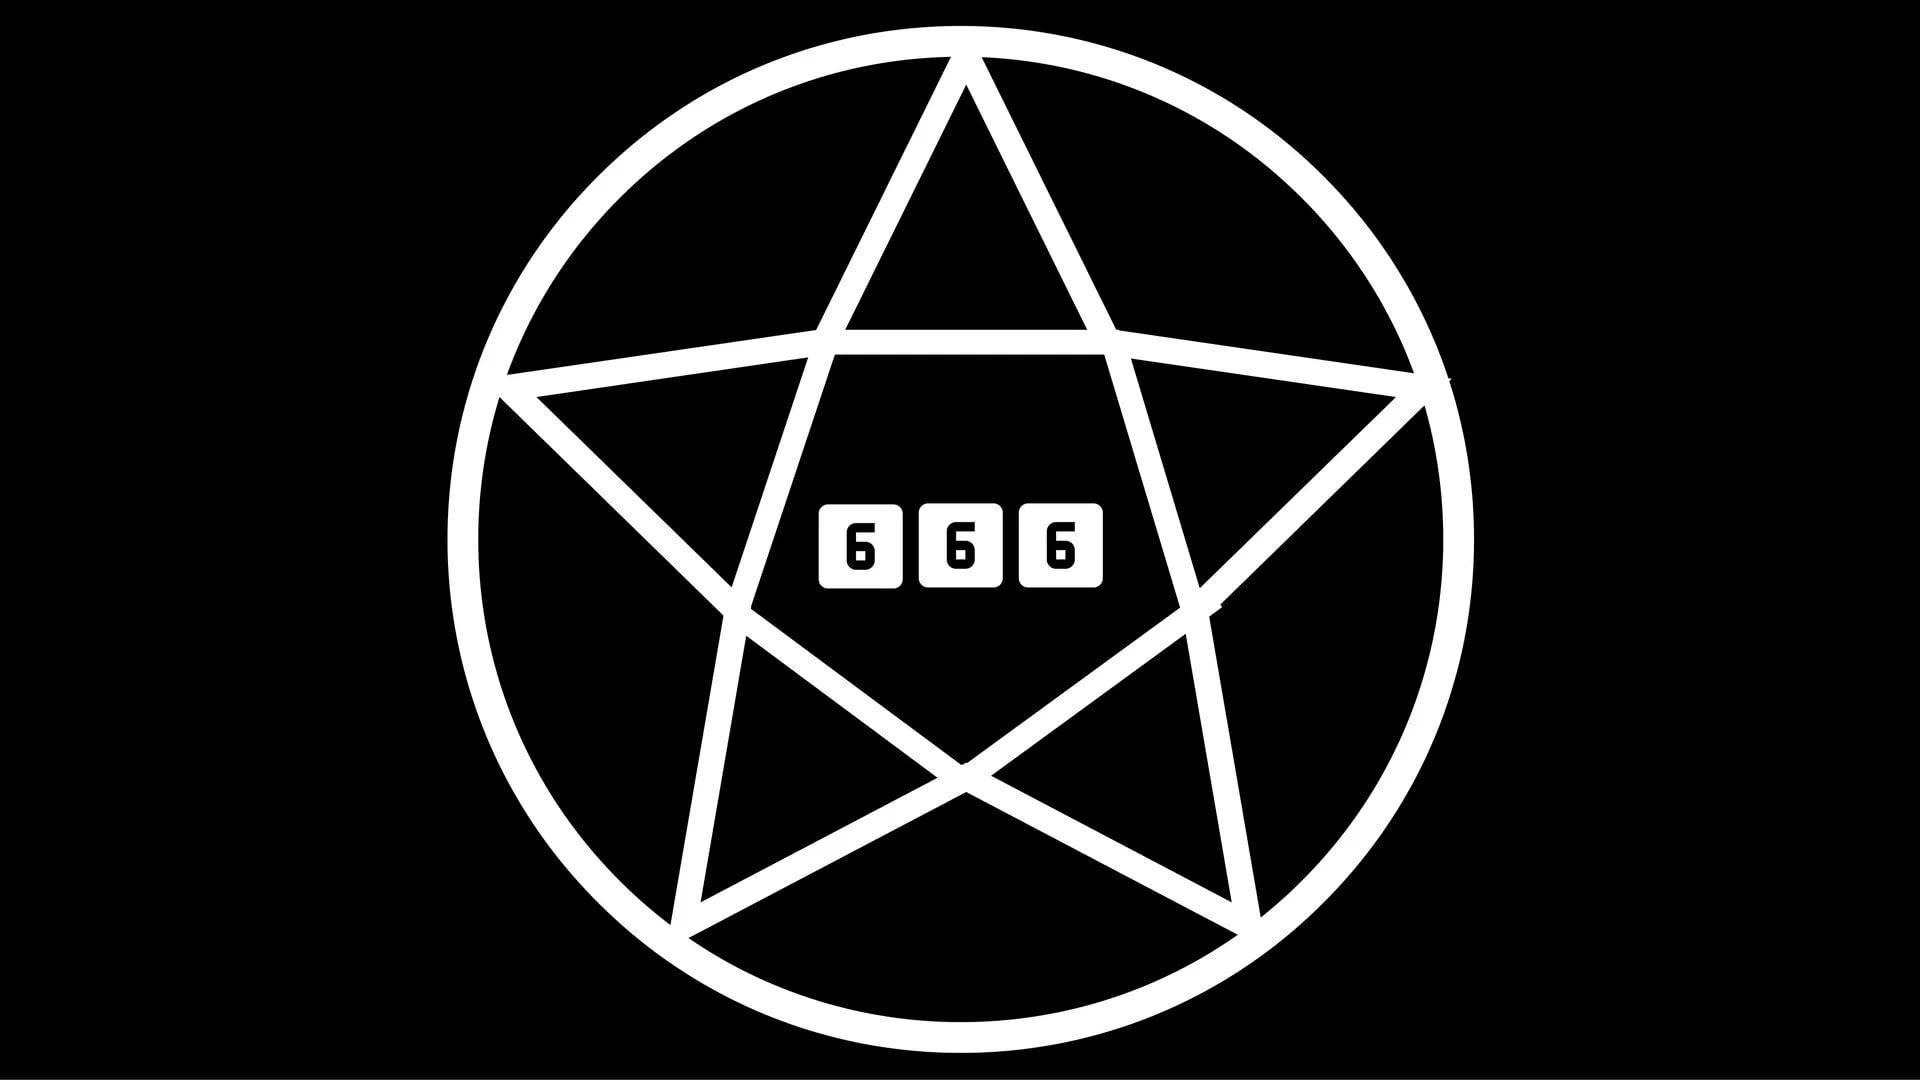 Pentagram free hd wallpaper